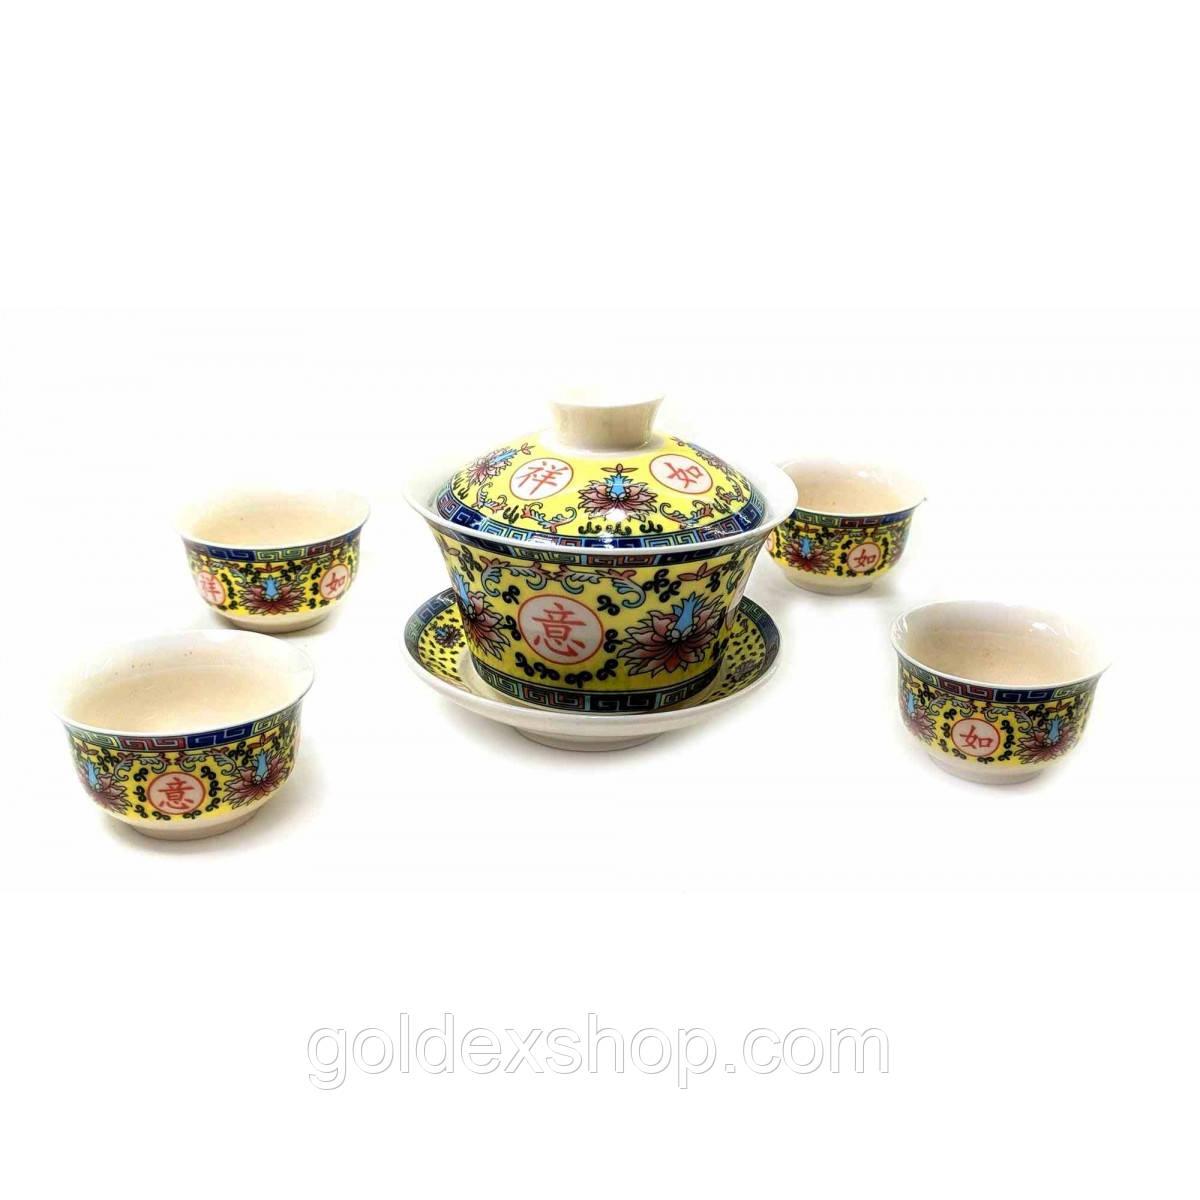 "Сервиз для чайной церемонии ""Иероглифы"" 17х18х9,5 см)(Заварник - 100мл., чашка - 20мл.)"